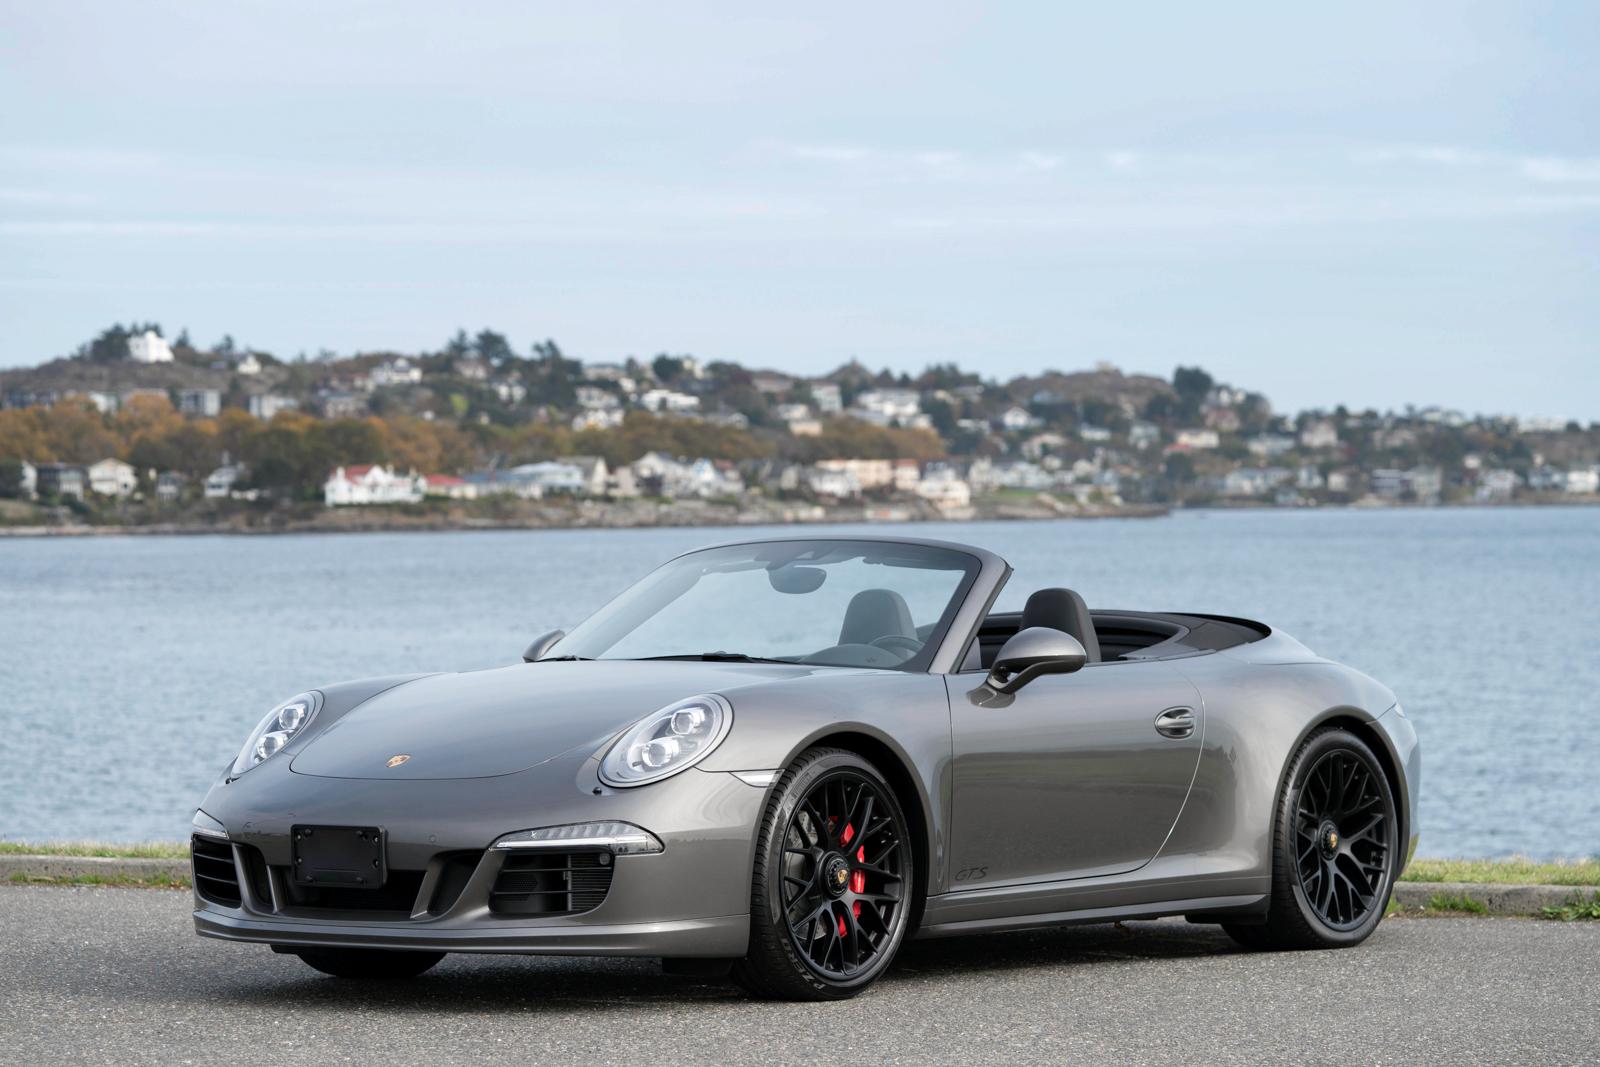 2015 Porsche 911 Carrera 4 Gts Cabriolet Pdk Silver Arrow Cars Ltd